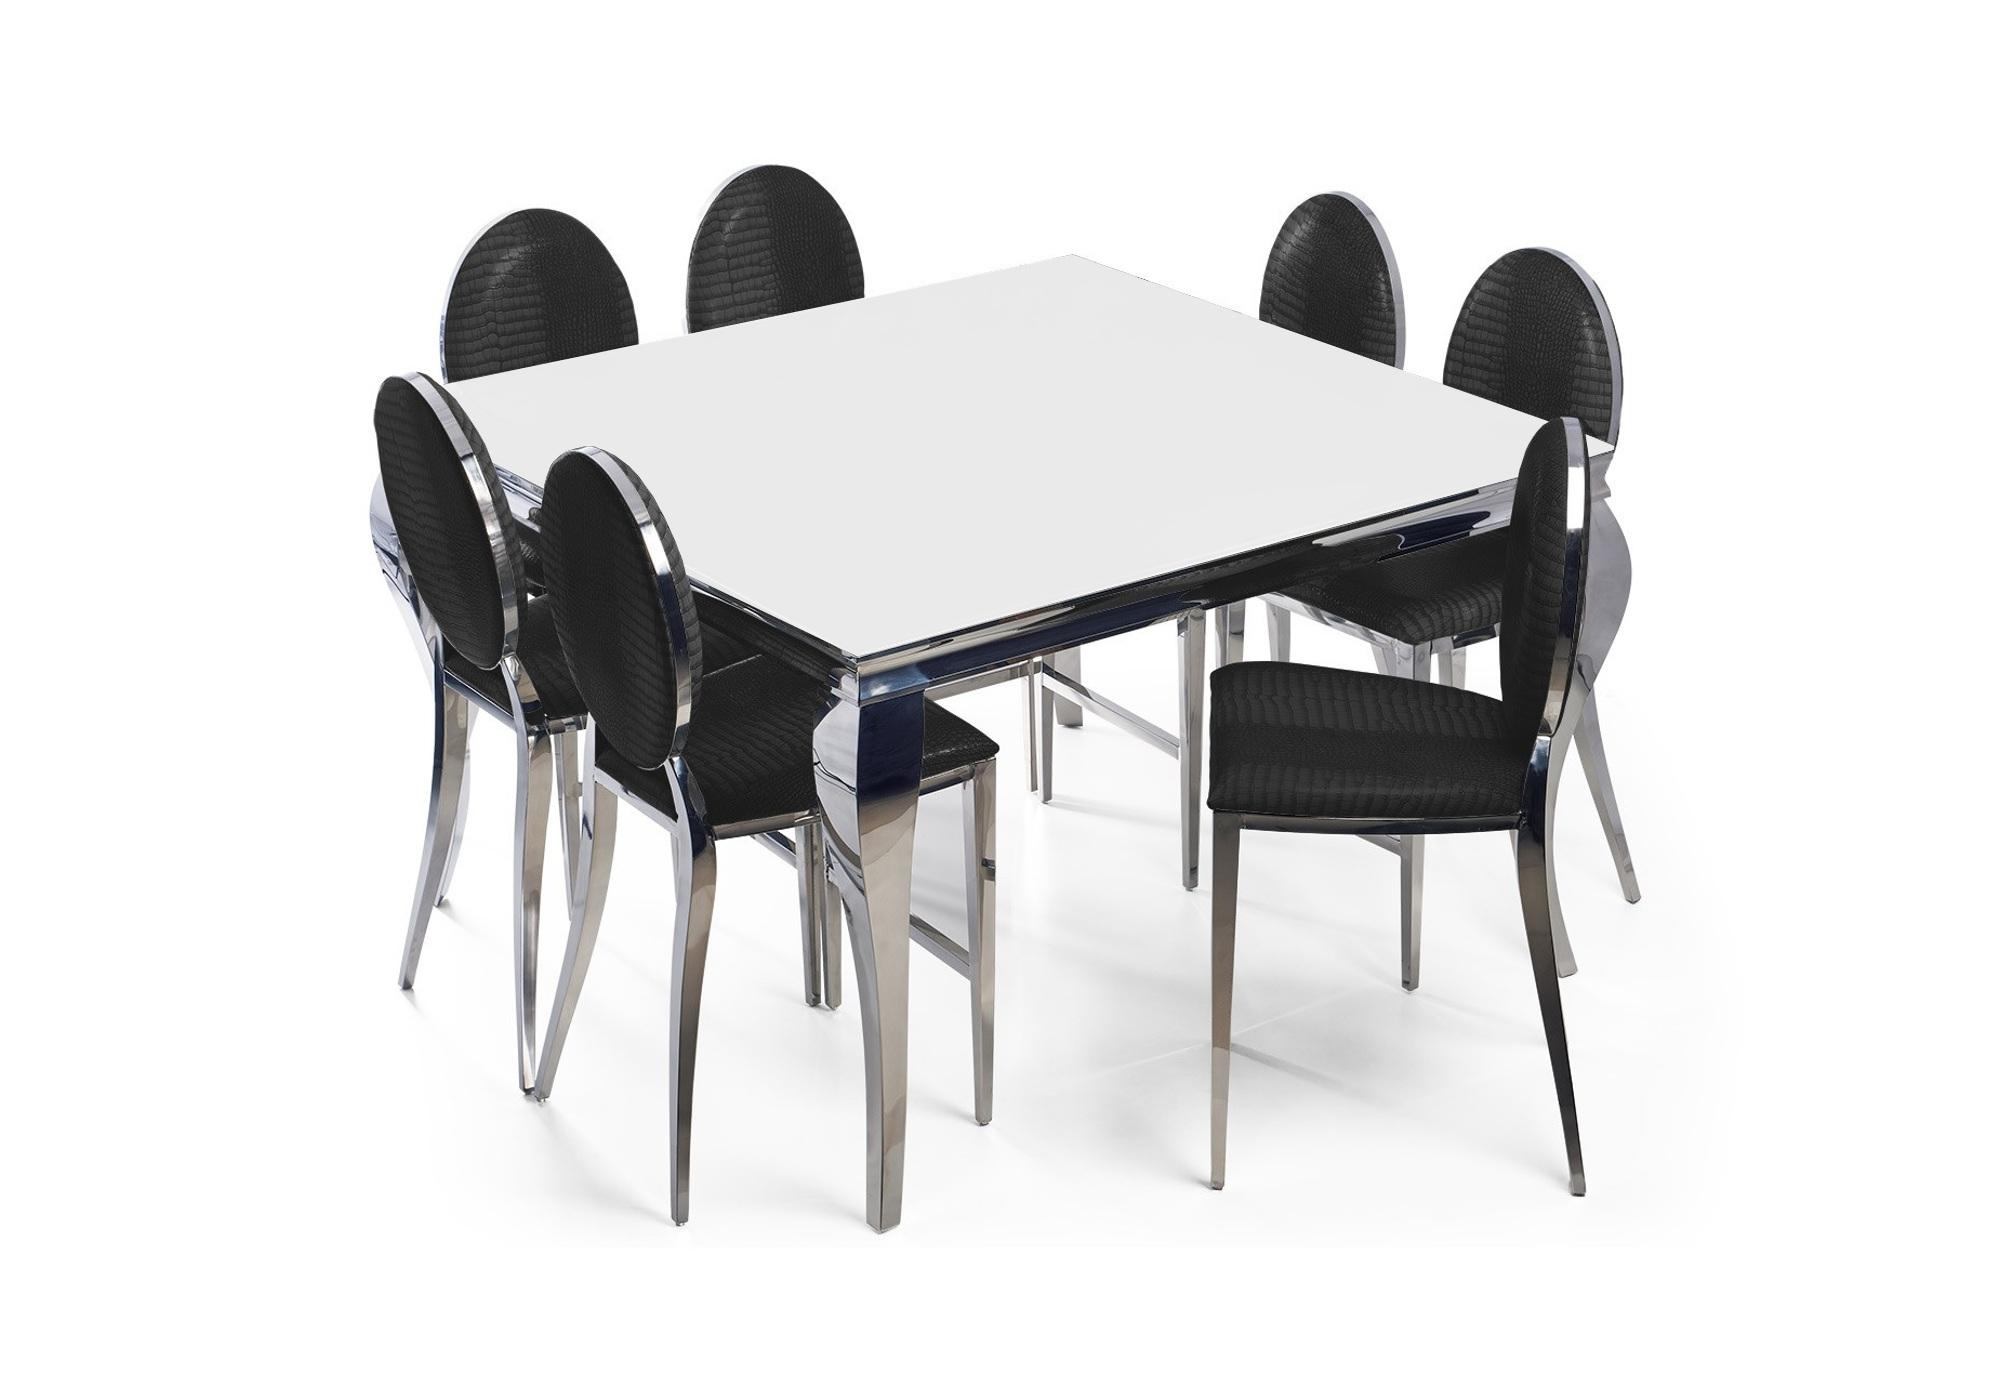 Table carré chromé blanc 4 chaises noir NEO